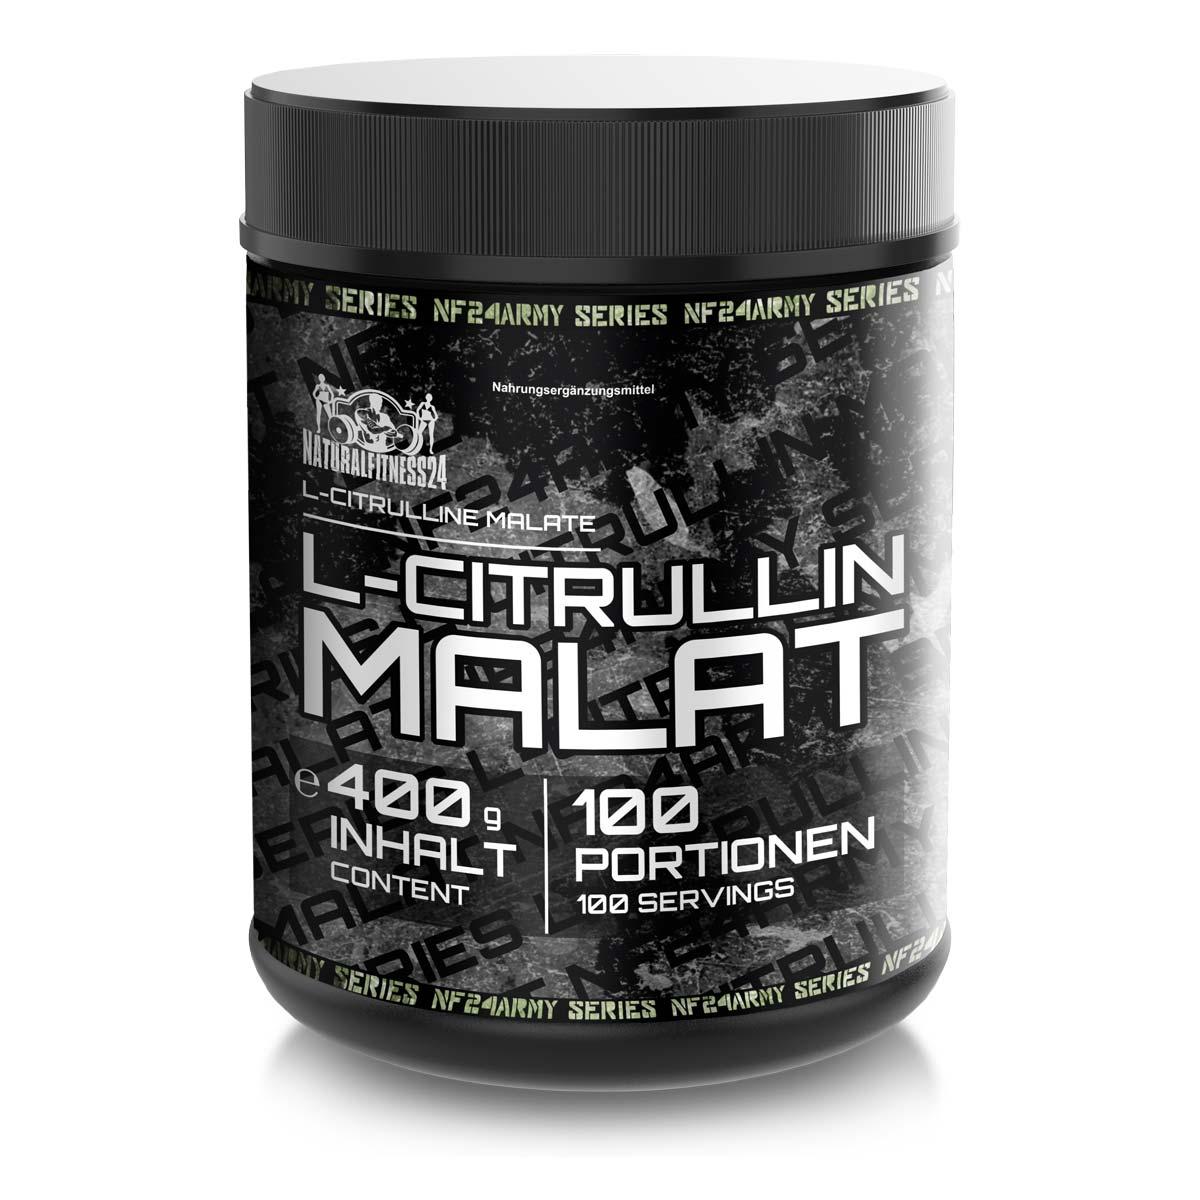 L-CITRULLIN-MALAT-Packshot5a4e32abab26b